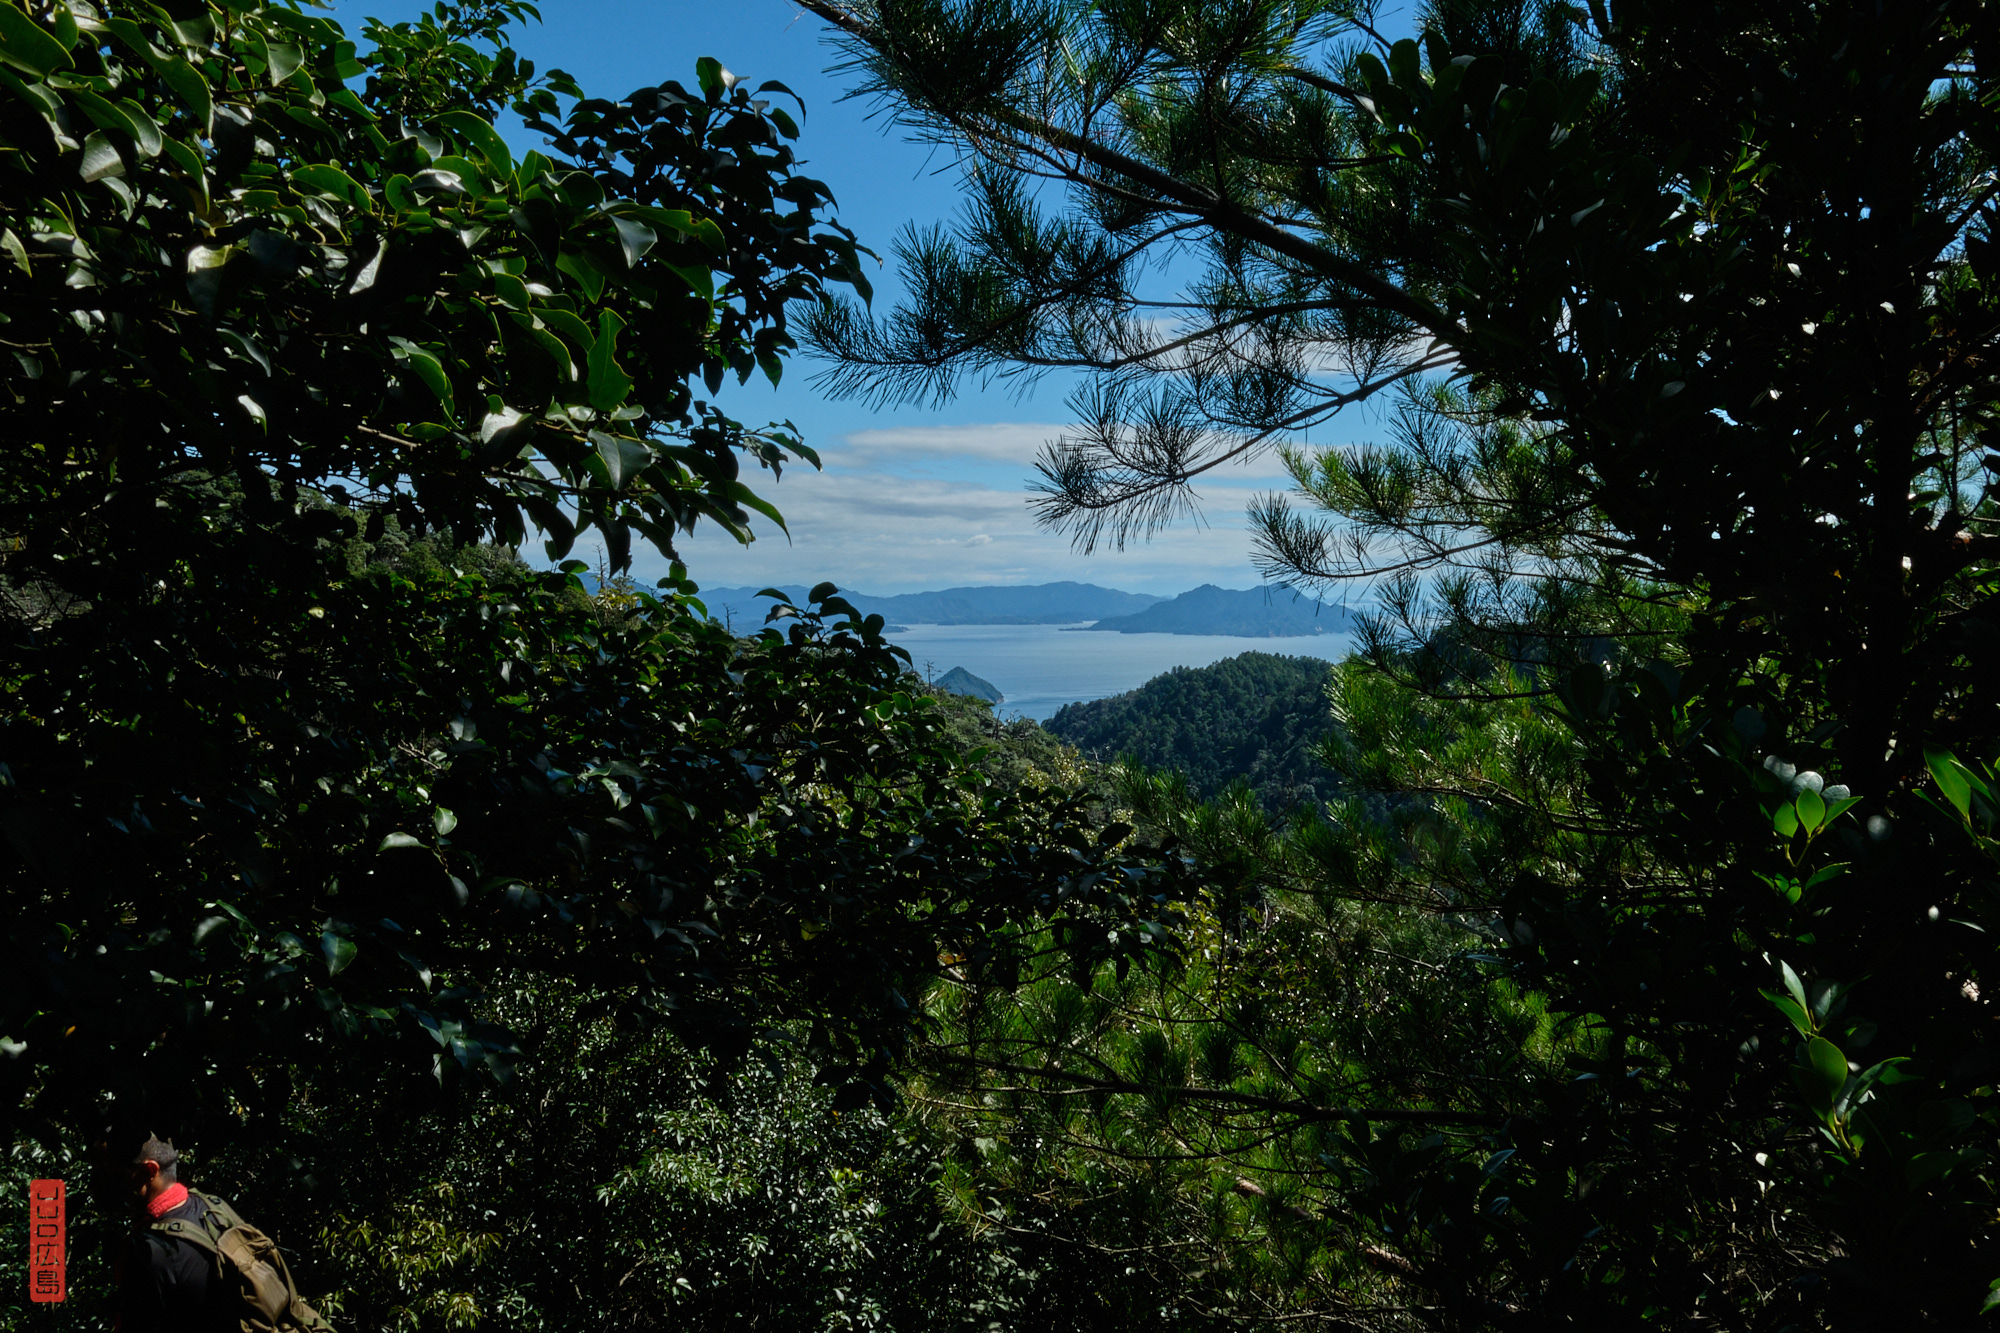 vue sur la mer de Seto depuis le Mont Misen, Miyajima